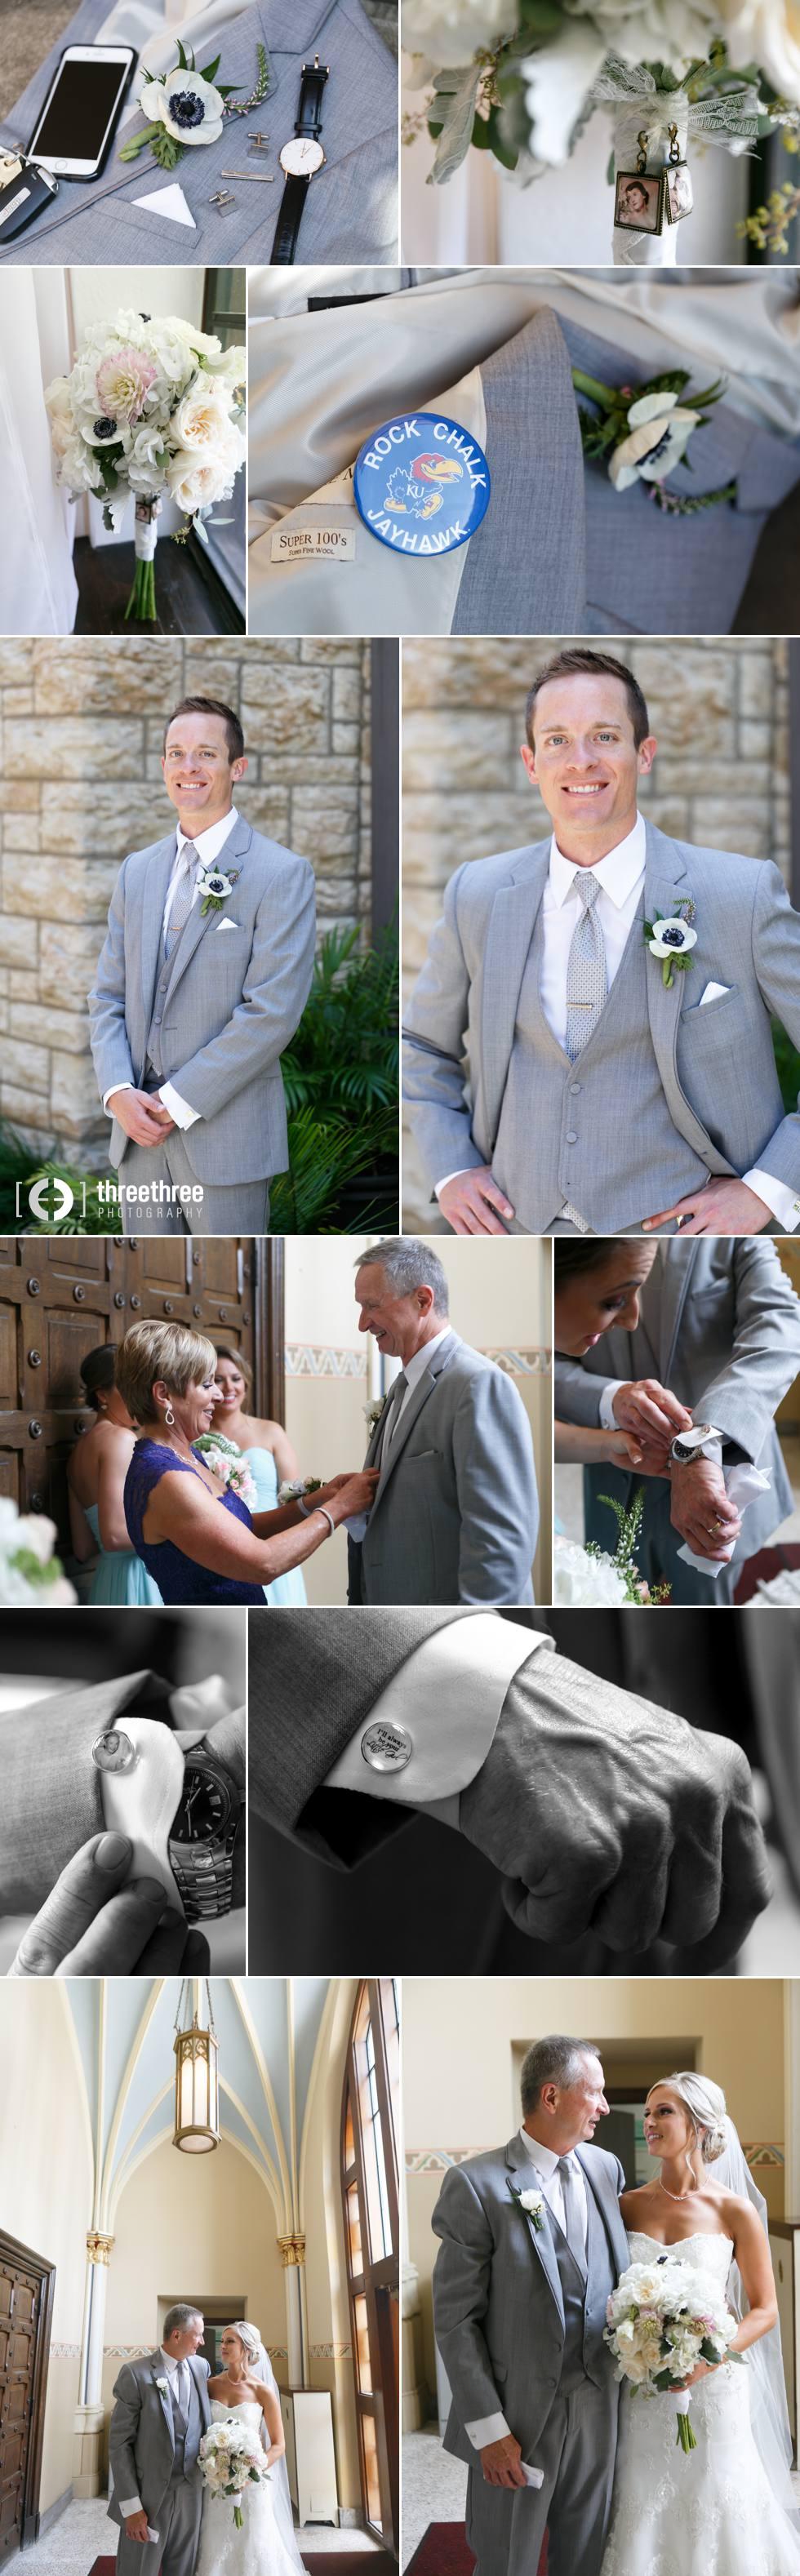 Natalie_AJ_wedding 4